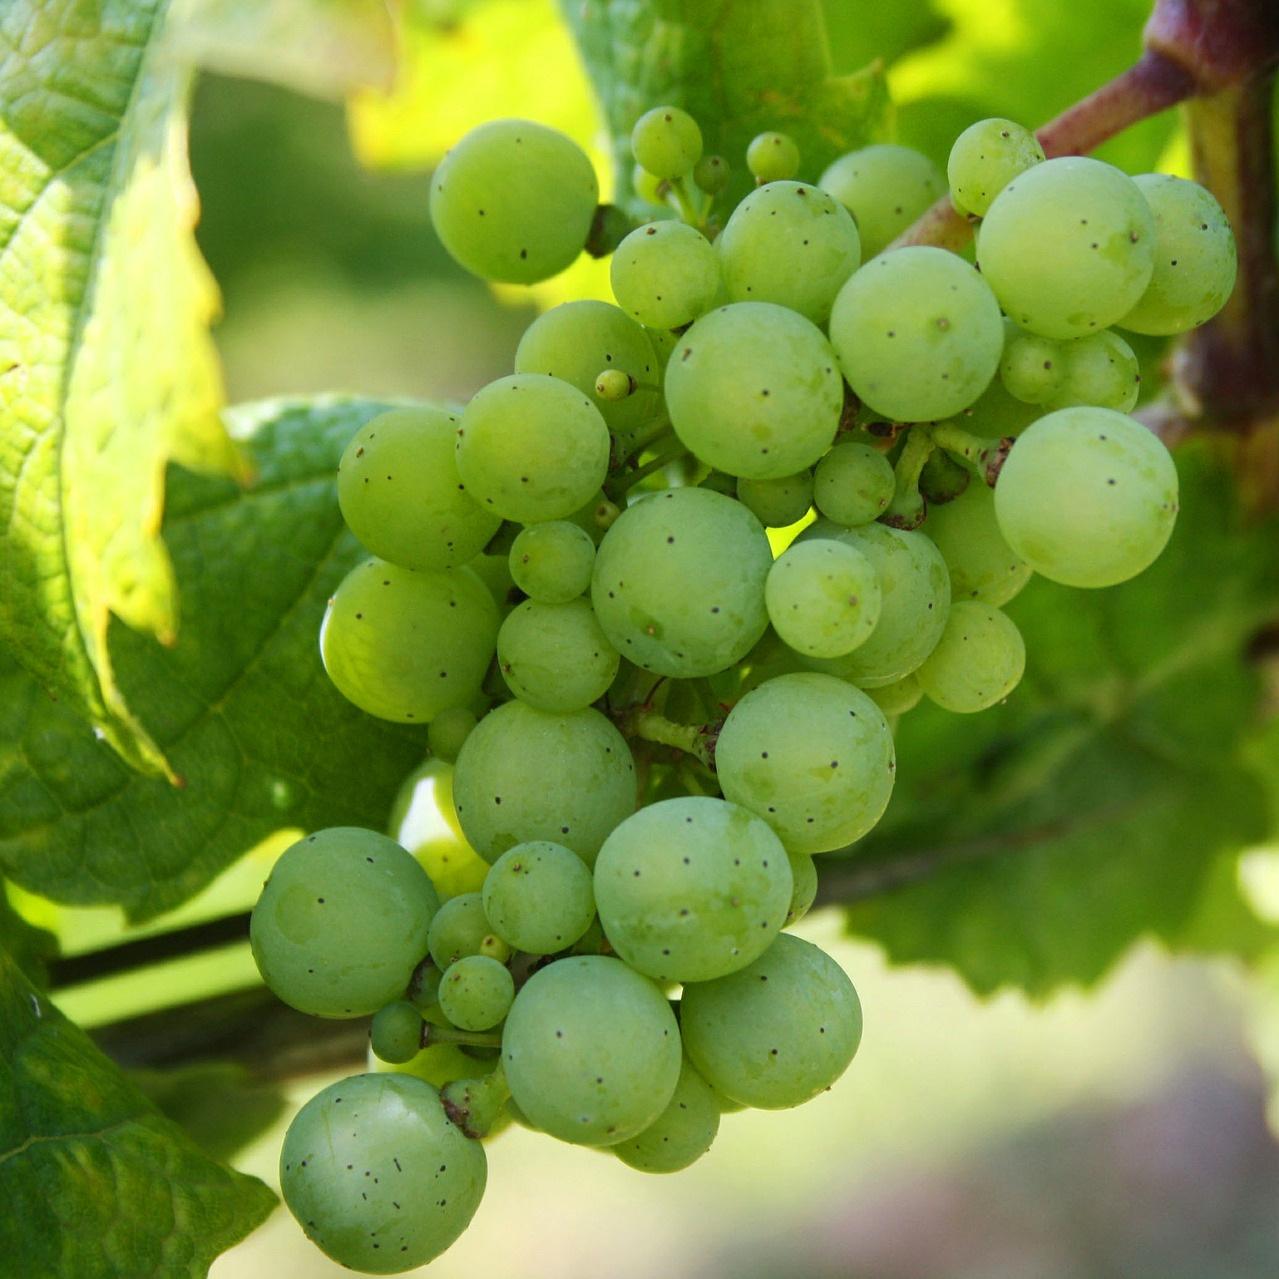 grapes-439300_1920.jpg